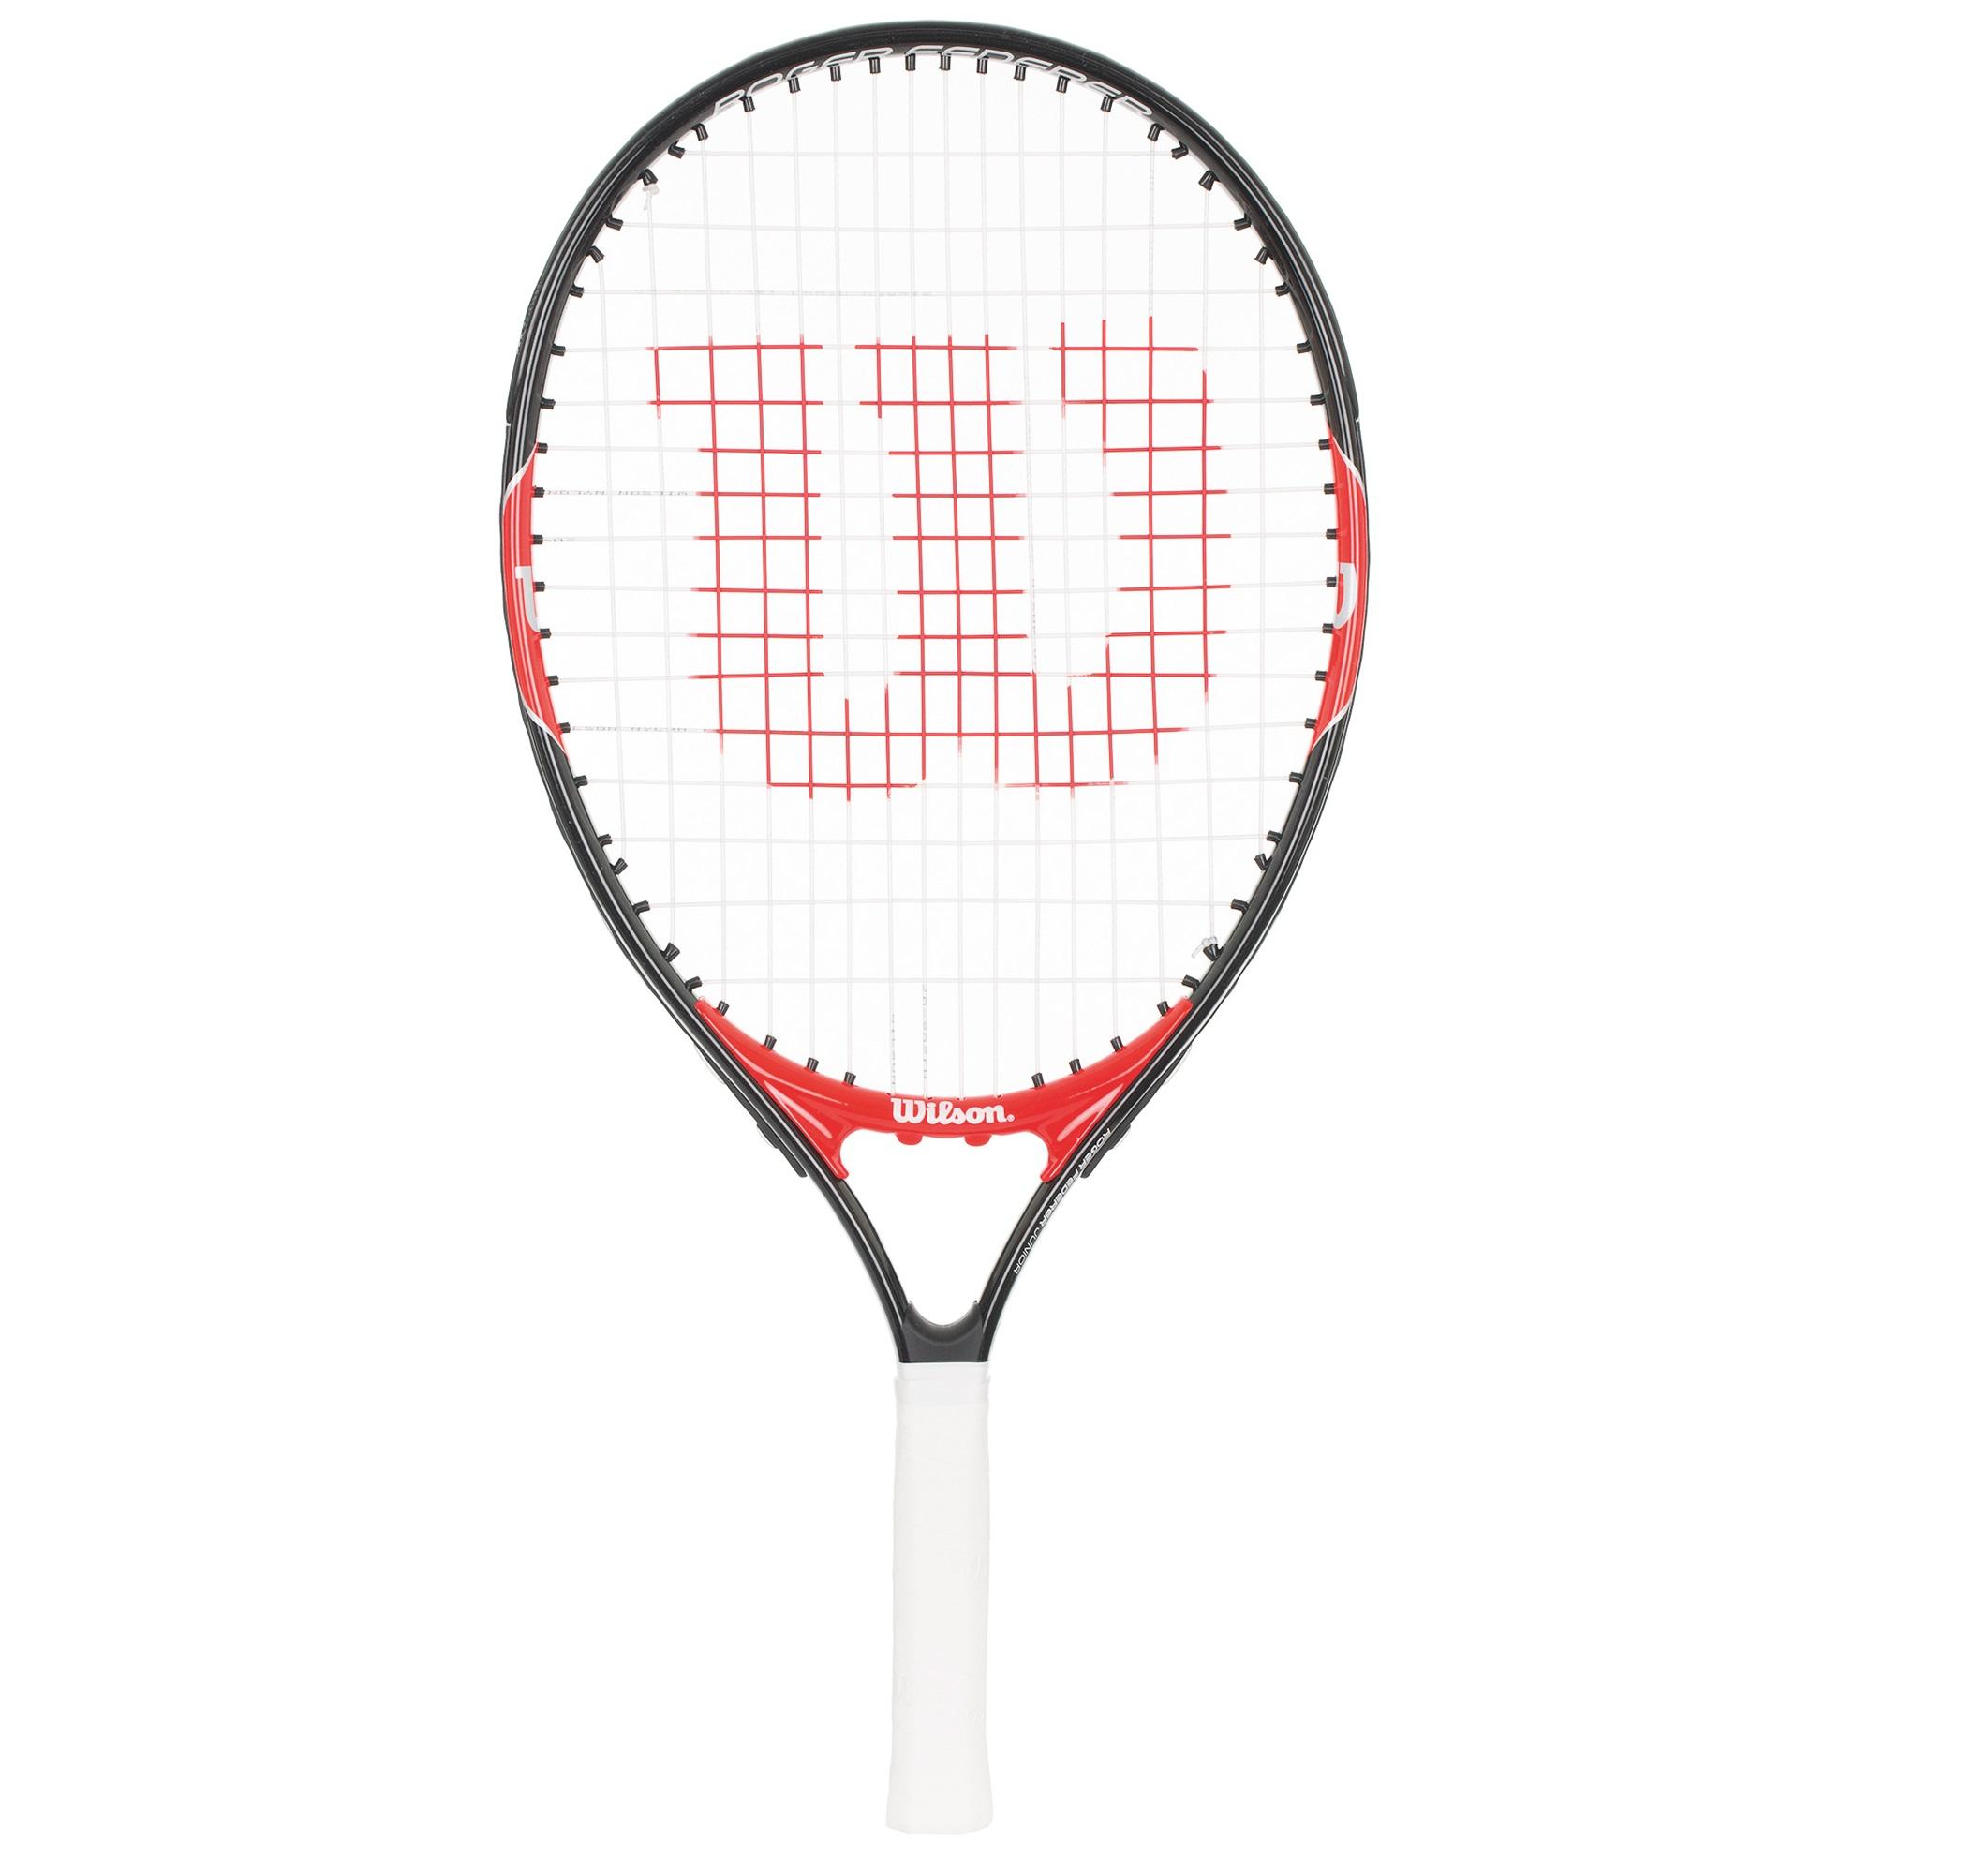 Wilson Ракетка для большого тенниса детская Wilson Roger Federer 21, размер Без размера wilson набор мячей для большого тенниса wilson us open x3 размер без размера